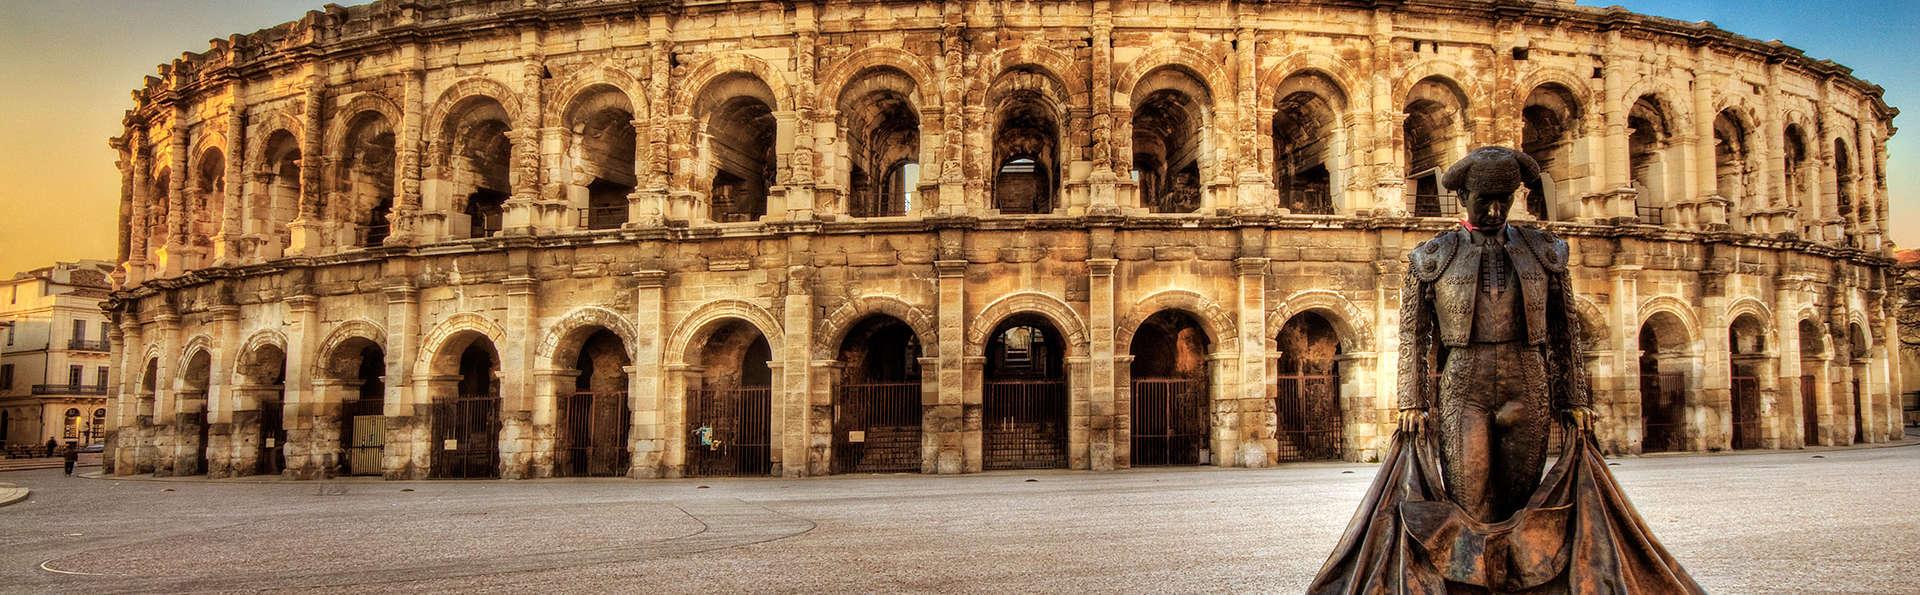 Best Western Marquis de la Baume - edit_Arenes_de_Nimes_panorama.jpg